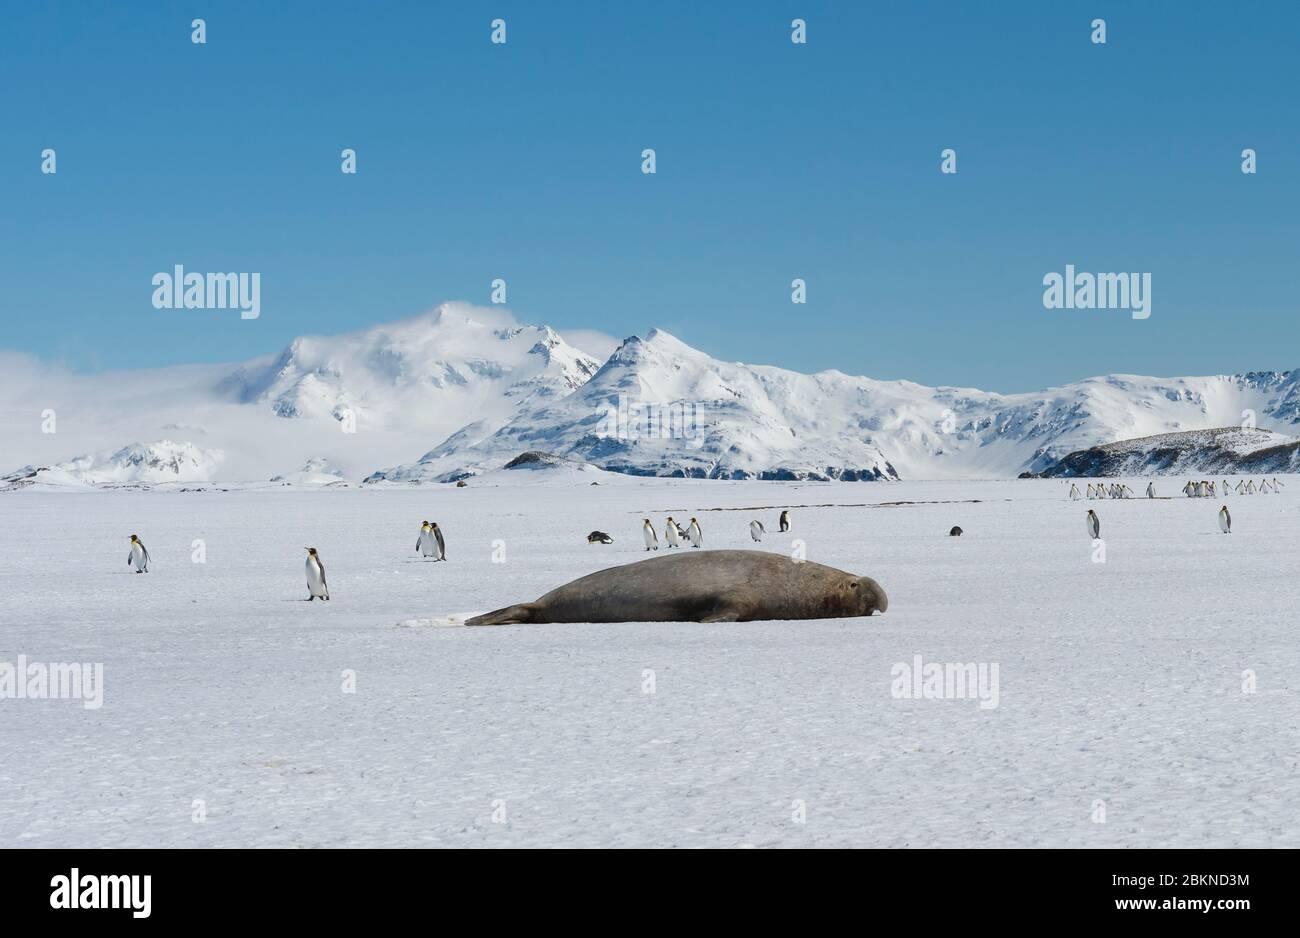 Male Southern Elephant seal (Mirounga leonina) and group of King Penguin (Aptenodytes patagonicus) walking on snow, Salisbury Plain, South Georgia Isl Stock Photo